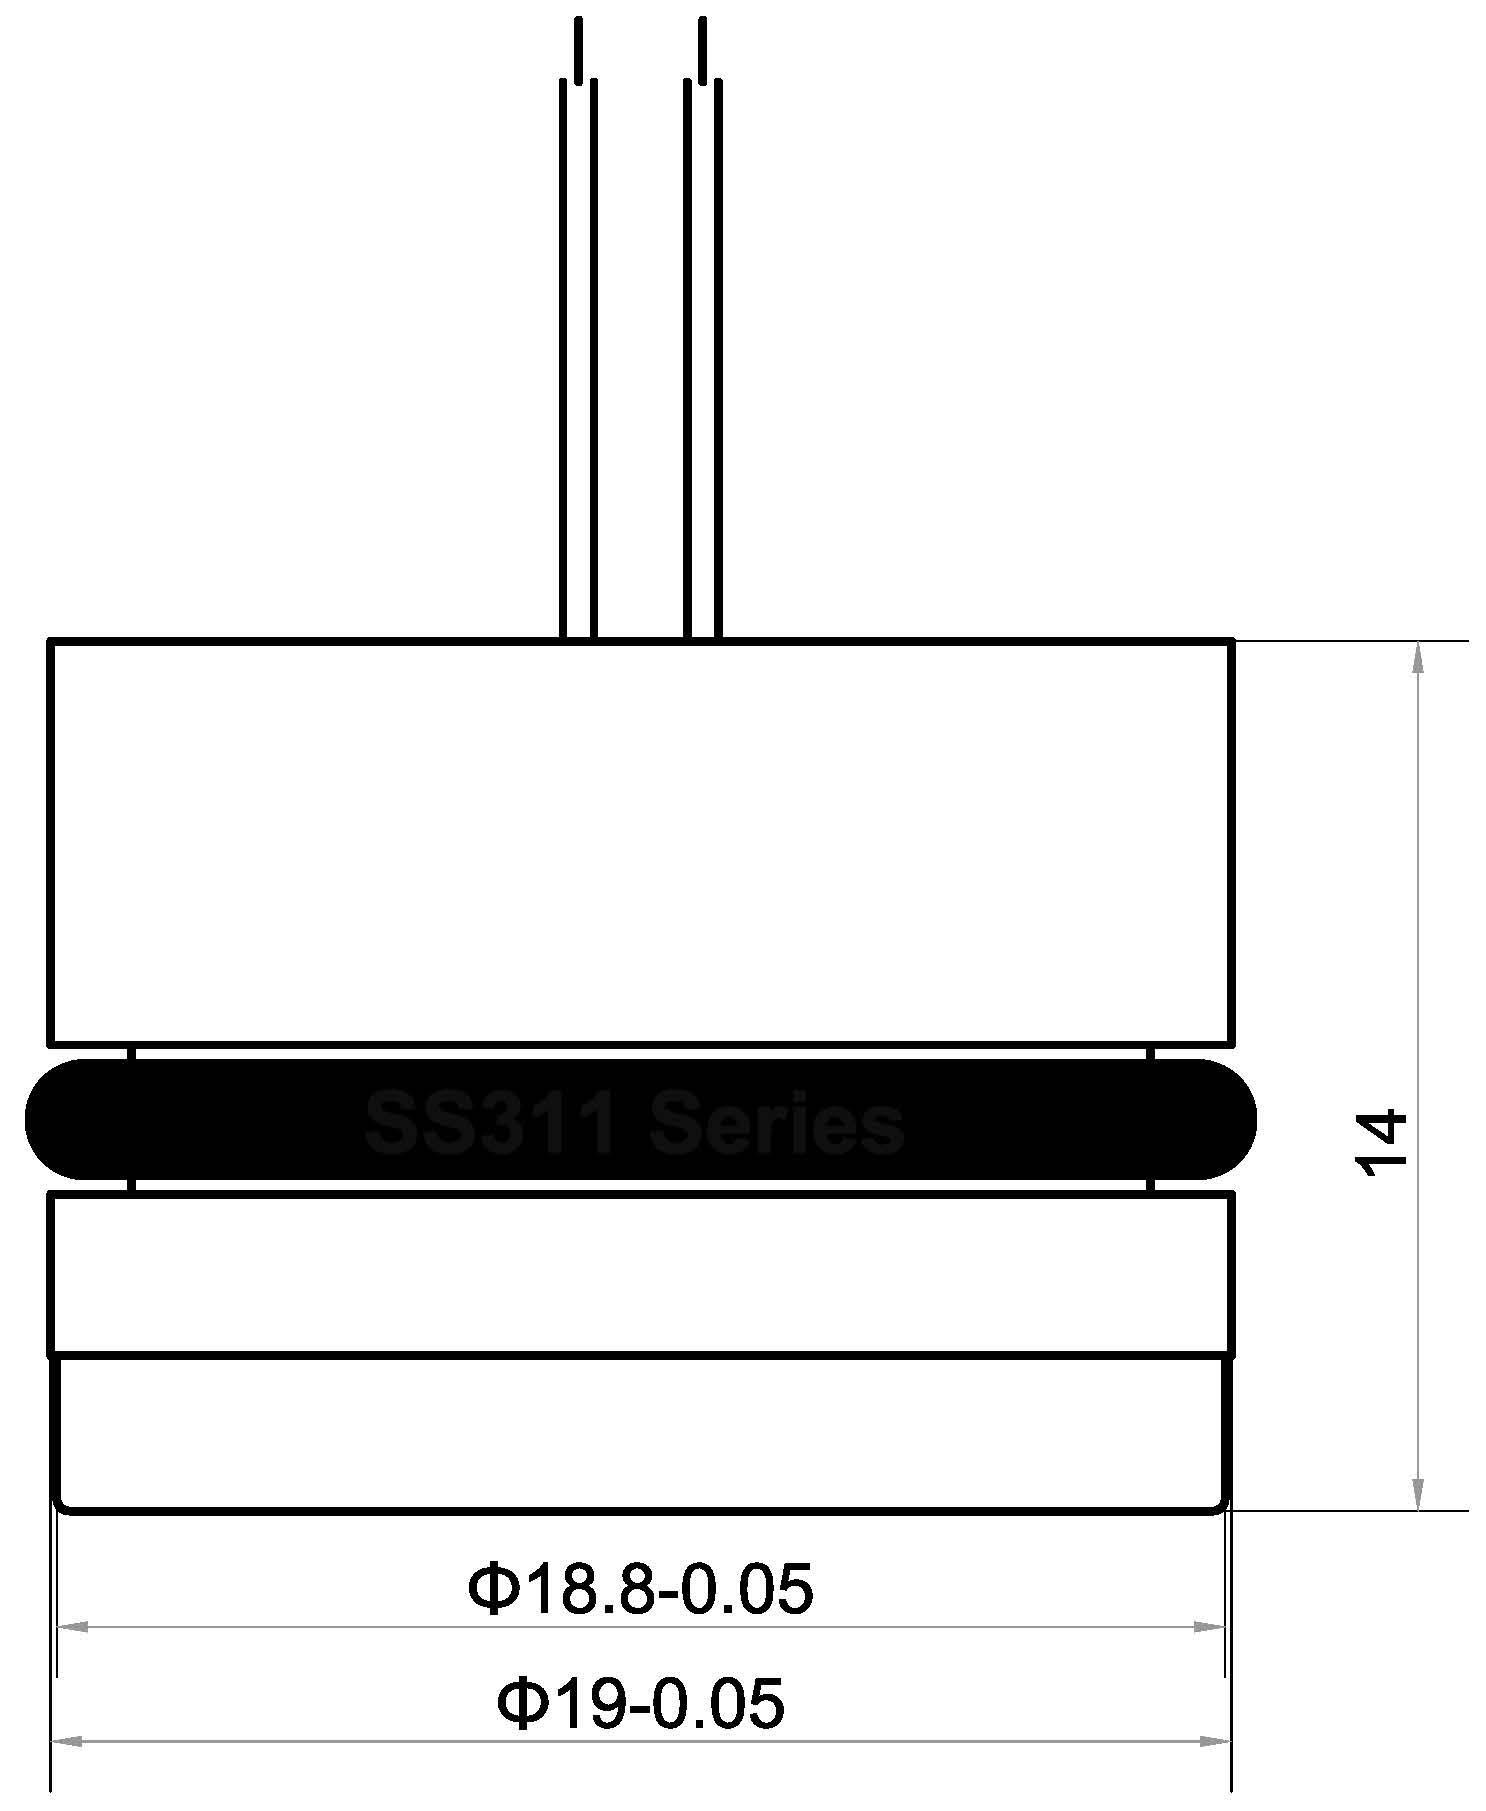 4-20 mA piezoresistive Drucksensor - Sendo Sensor